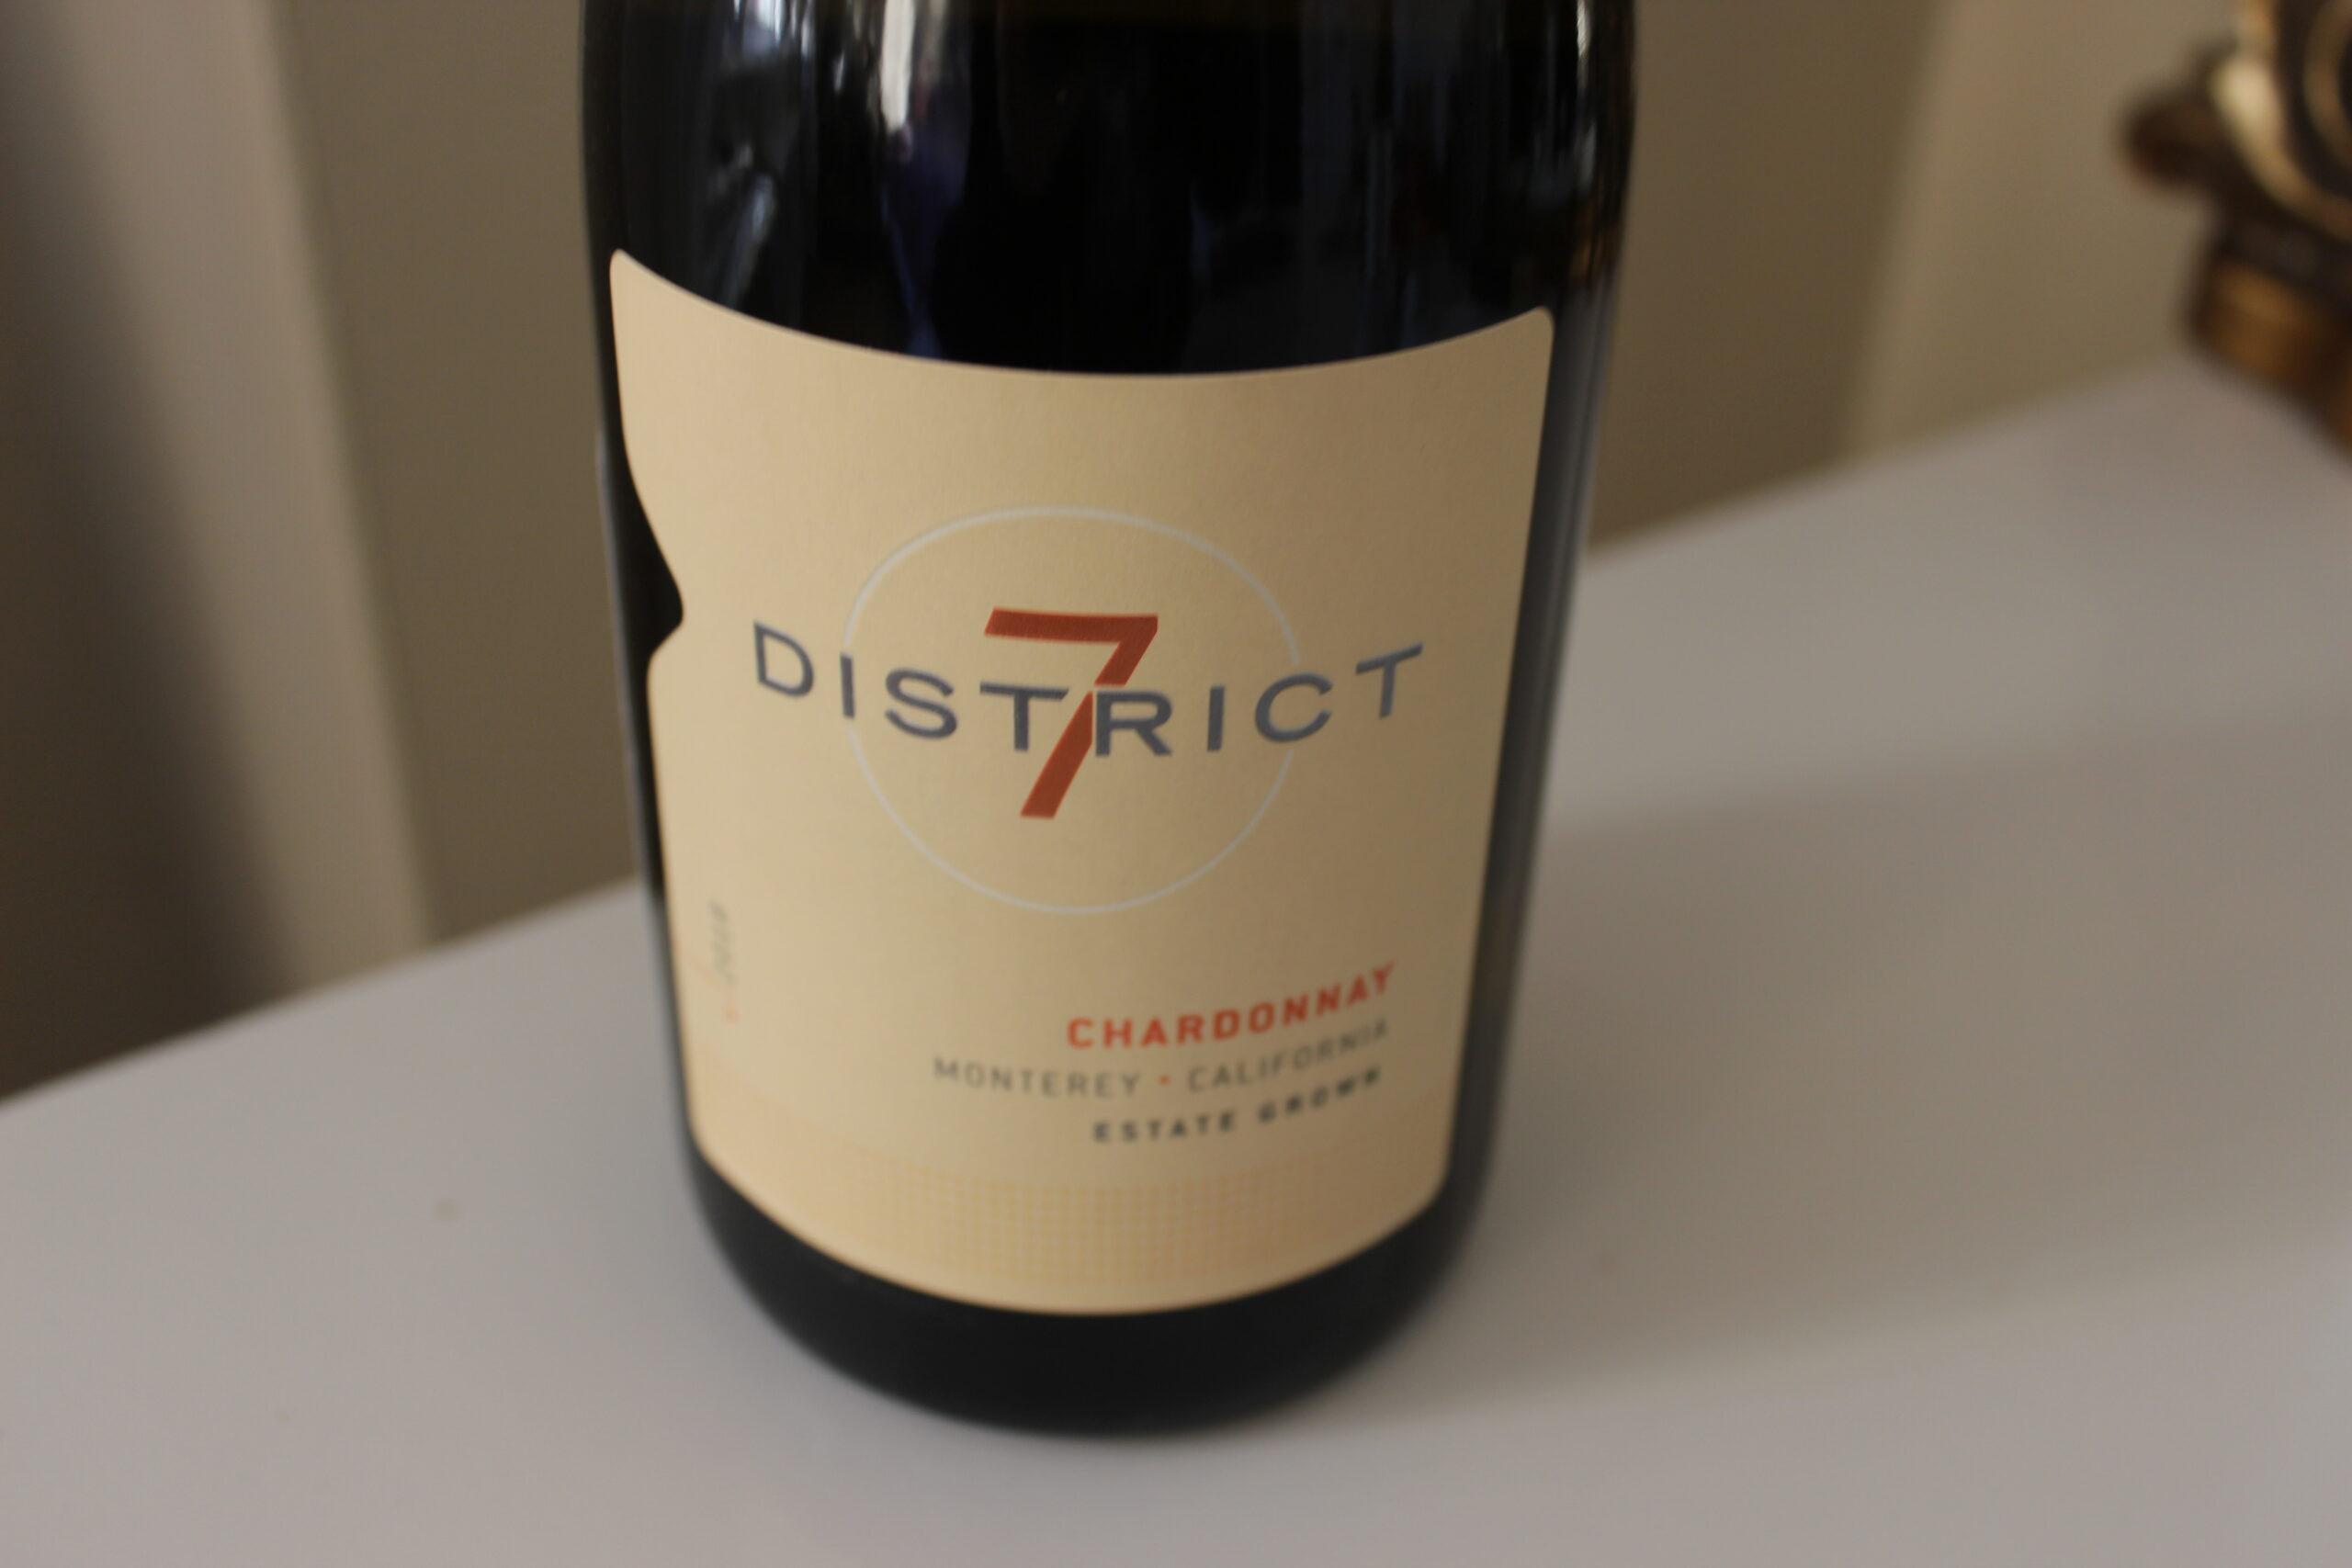 The 7 District 2018 Estate Grown Chardonnay Monterey